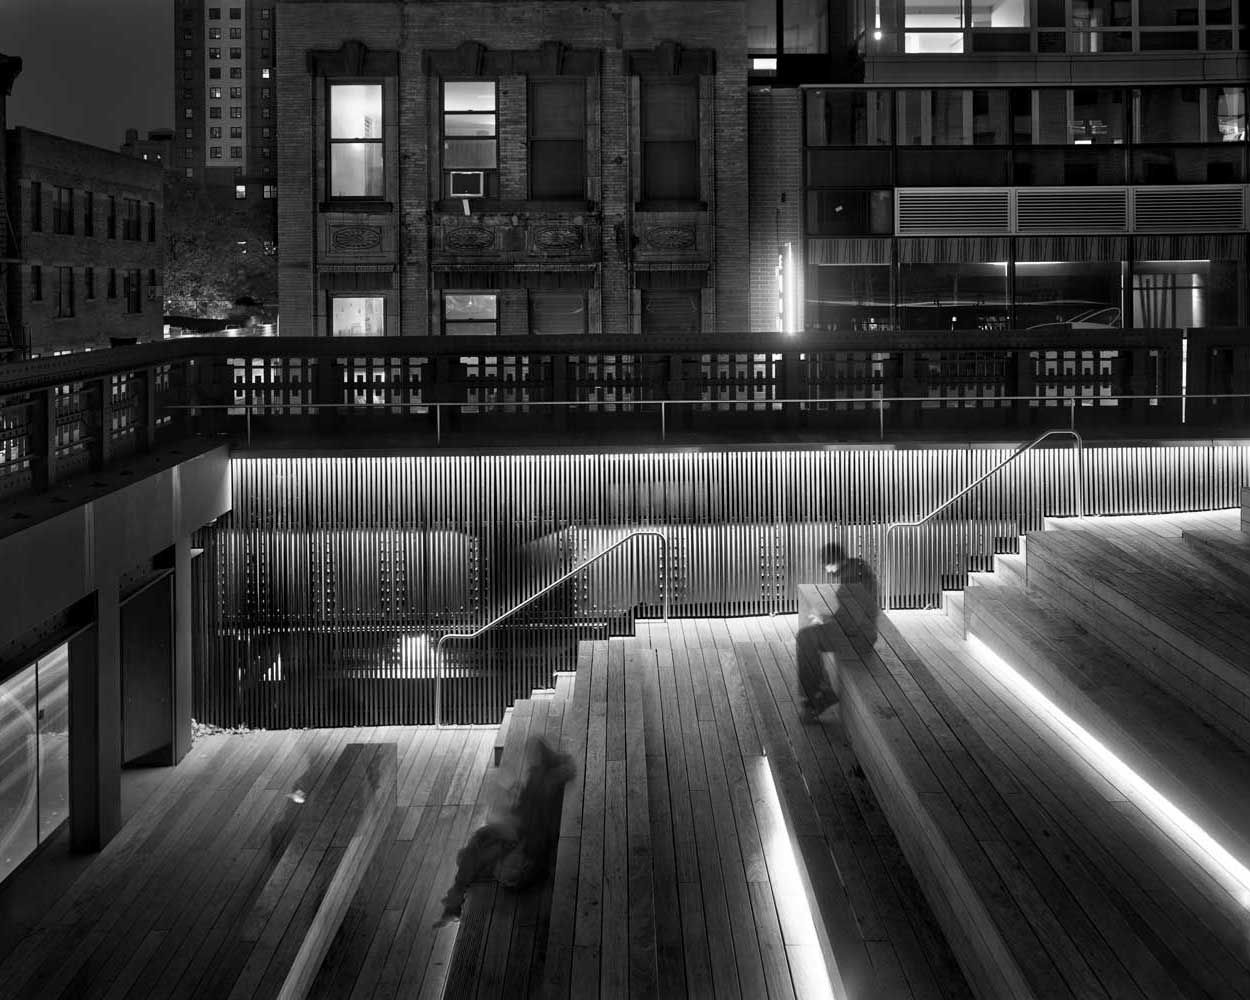 MATTHEW PILLSBURY » Sitting on the High Line, 2011